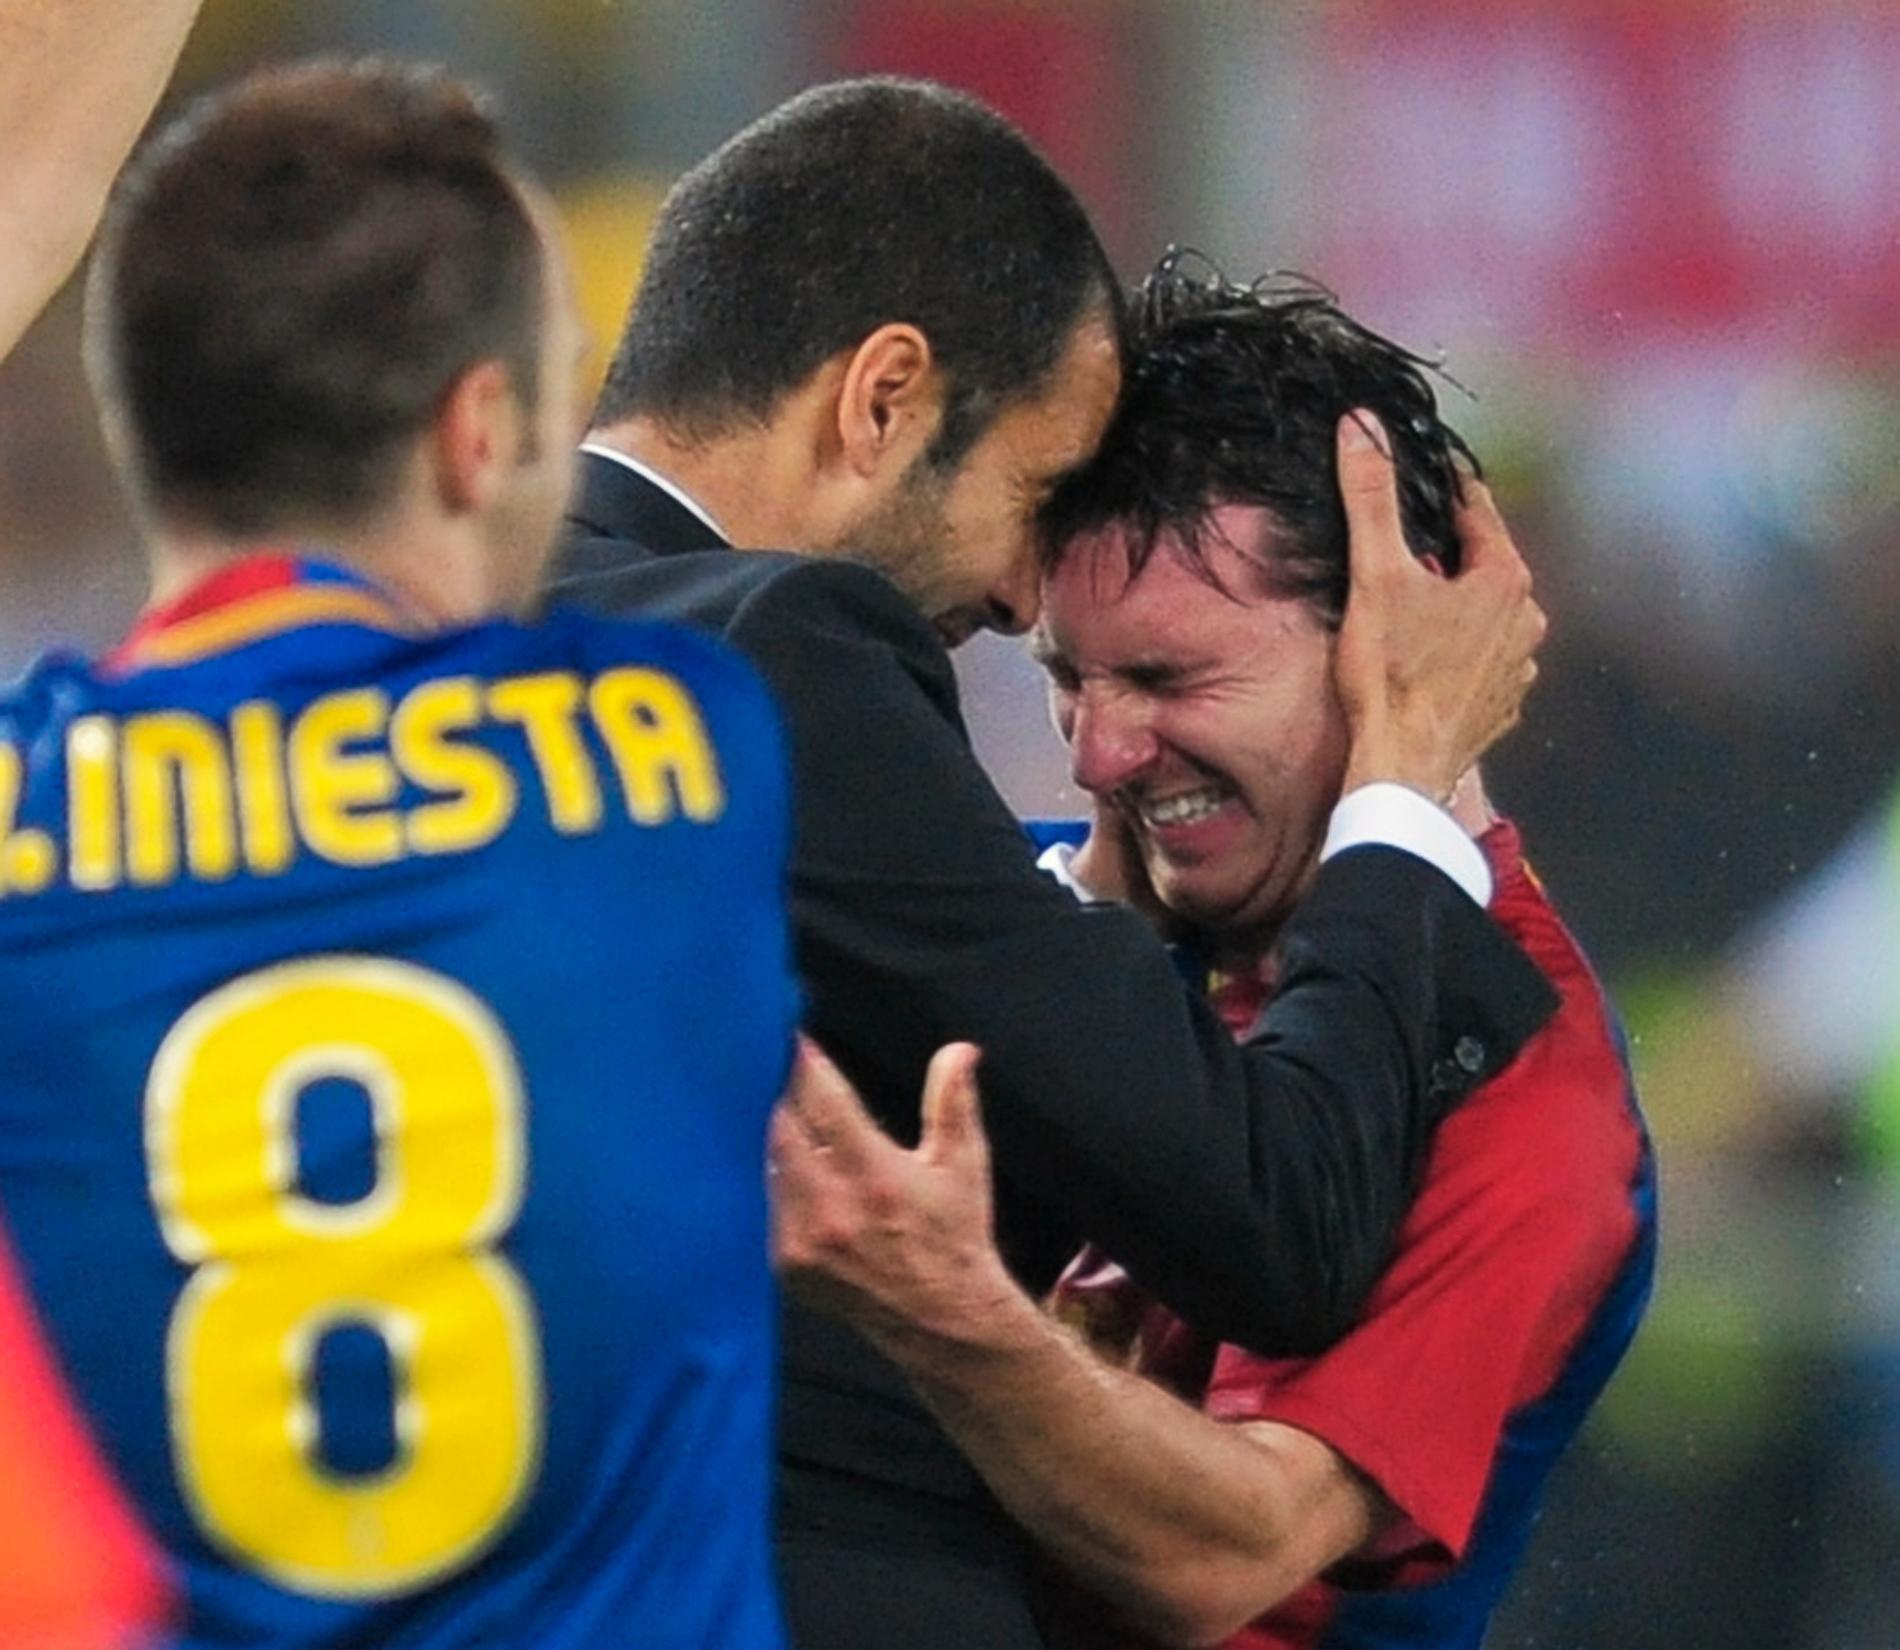 Det var då det. Barcelona har vunnit Champions League-finalen mot Manchester United 2009. Pep Guardiola kramar om Lionel Messi. På tisdagskvällen stöter de på varandra igen – nu på Parc des Princes i Paris. Arkivbild.